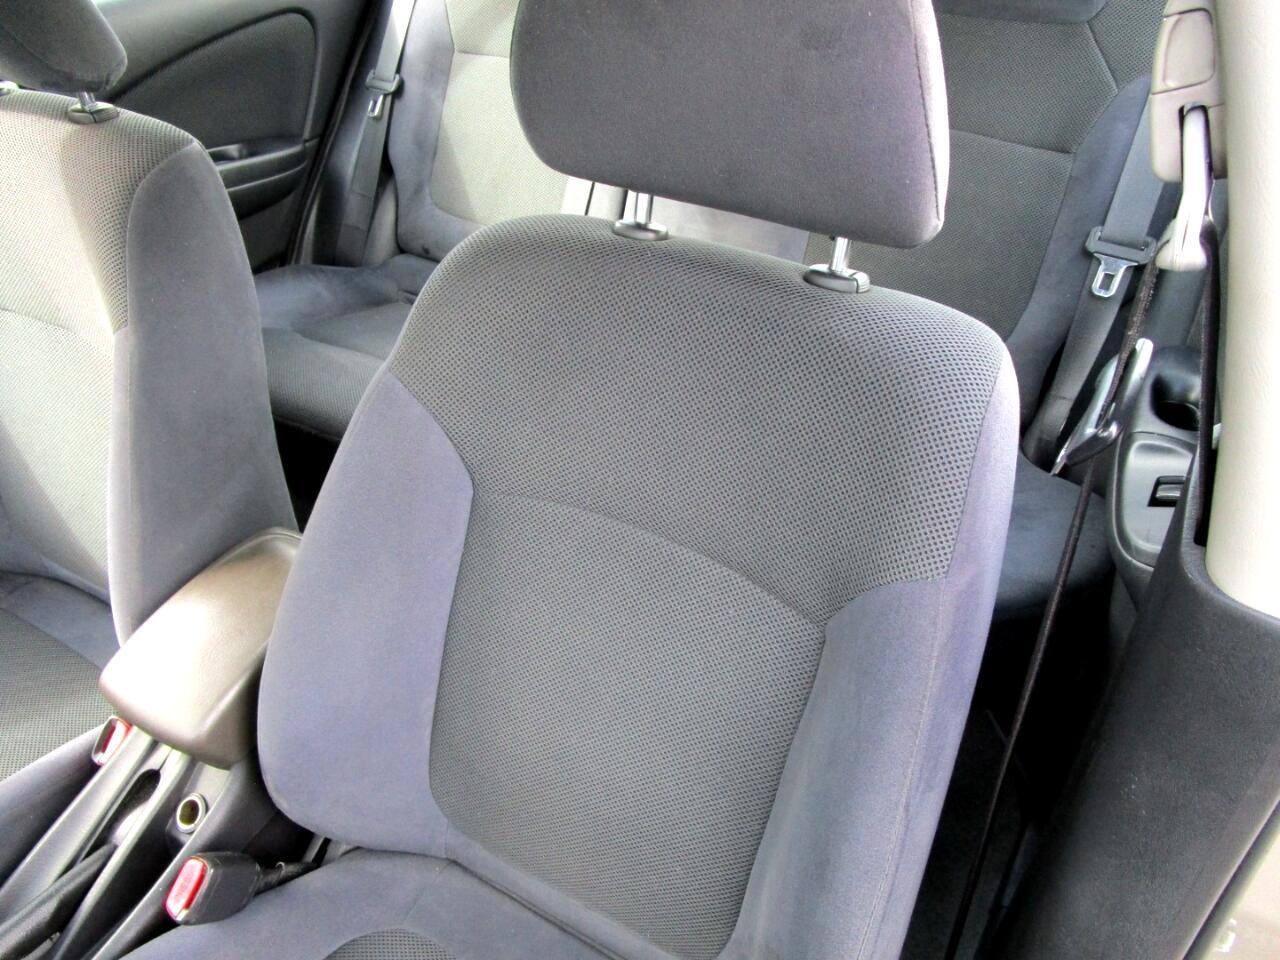 2006 Nissan Sentra 4dr Sdn I4 Auto 1.8 S